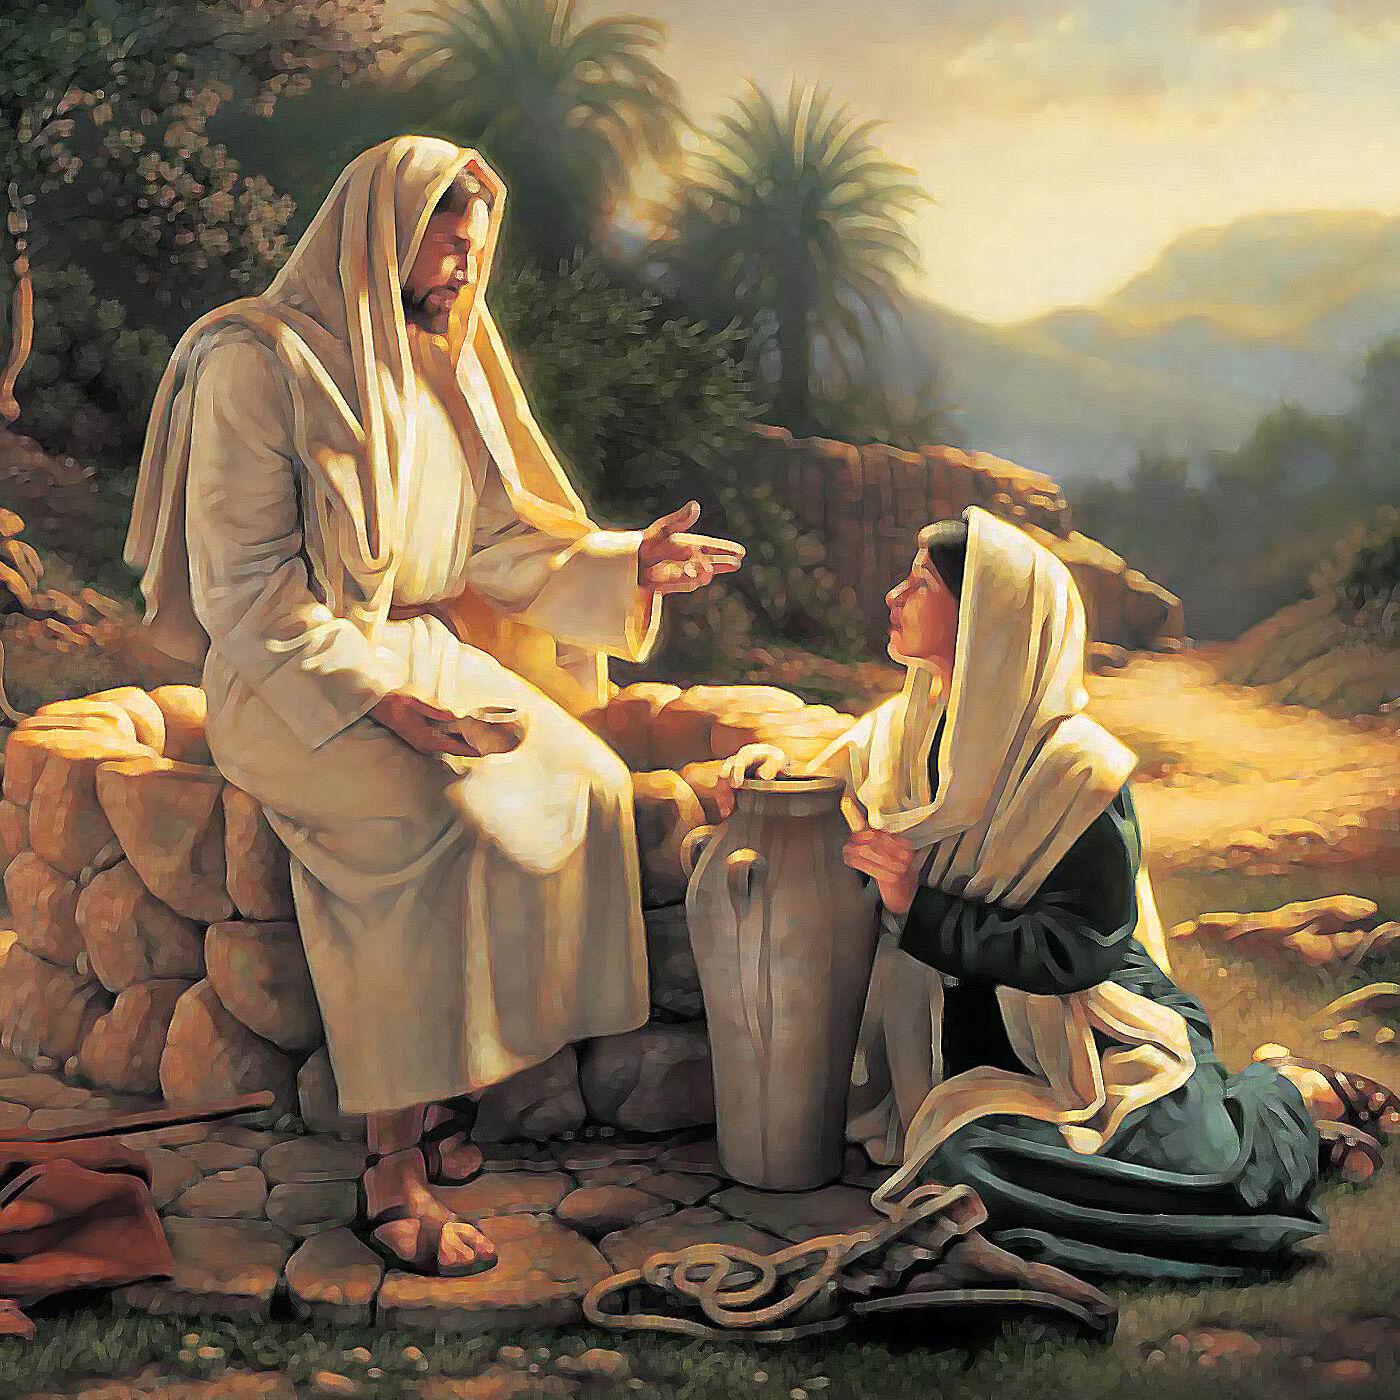 riflessioni sul Vangelo di Giovedì 7 Gennaio 2021 (Mt 4, 12-17. 23-25) - Apostola Francesca